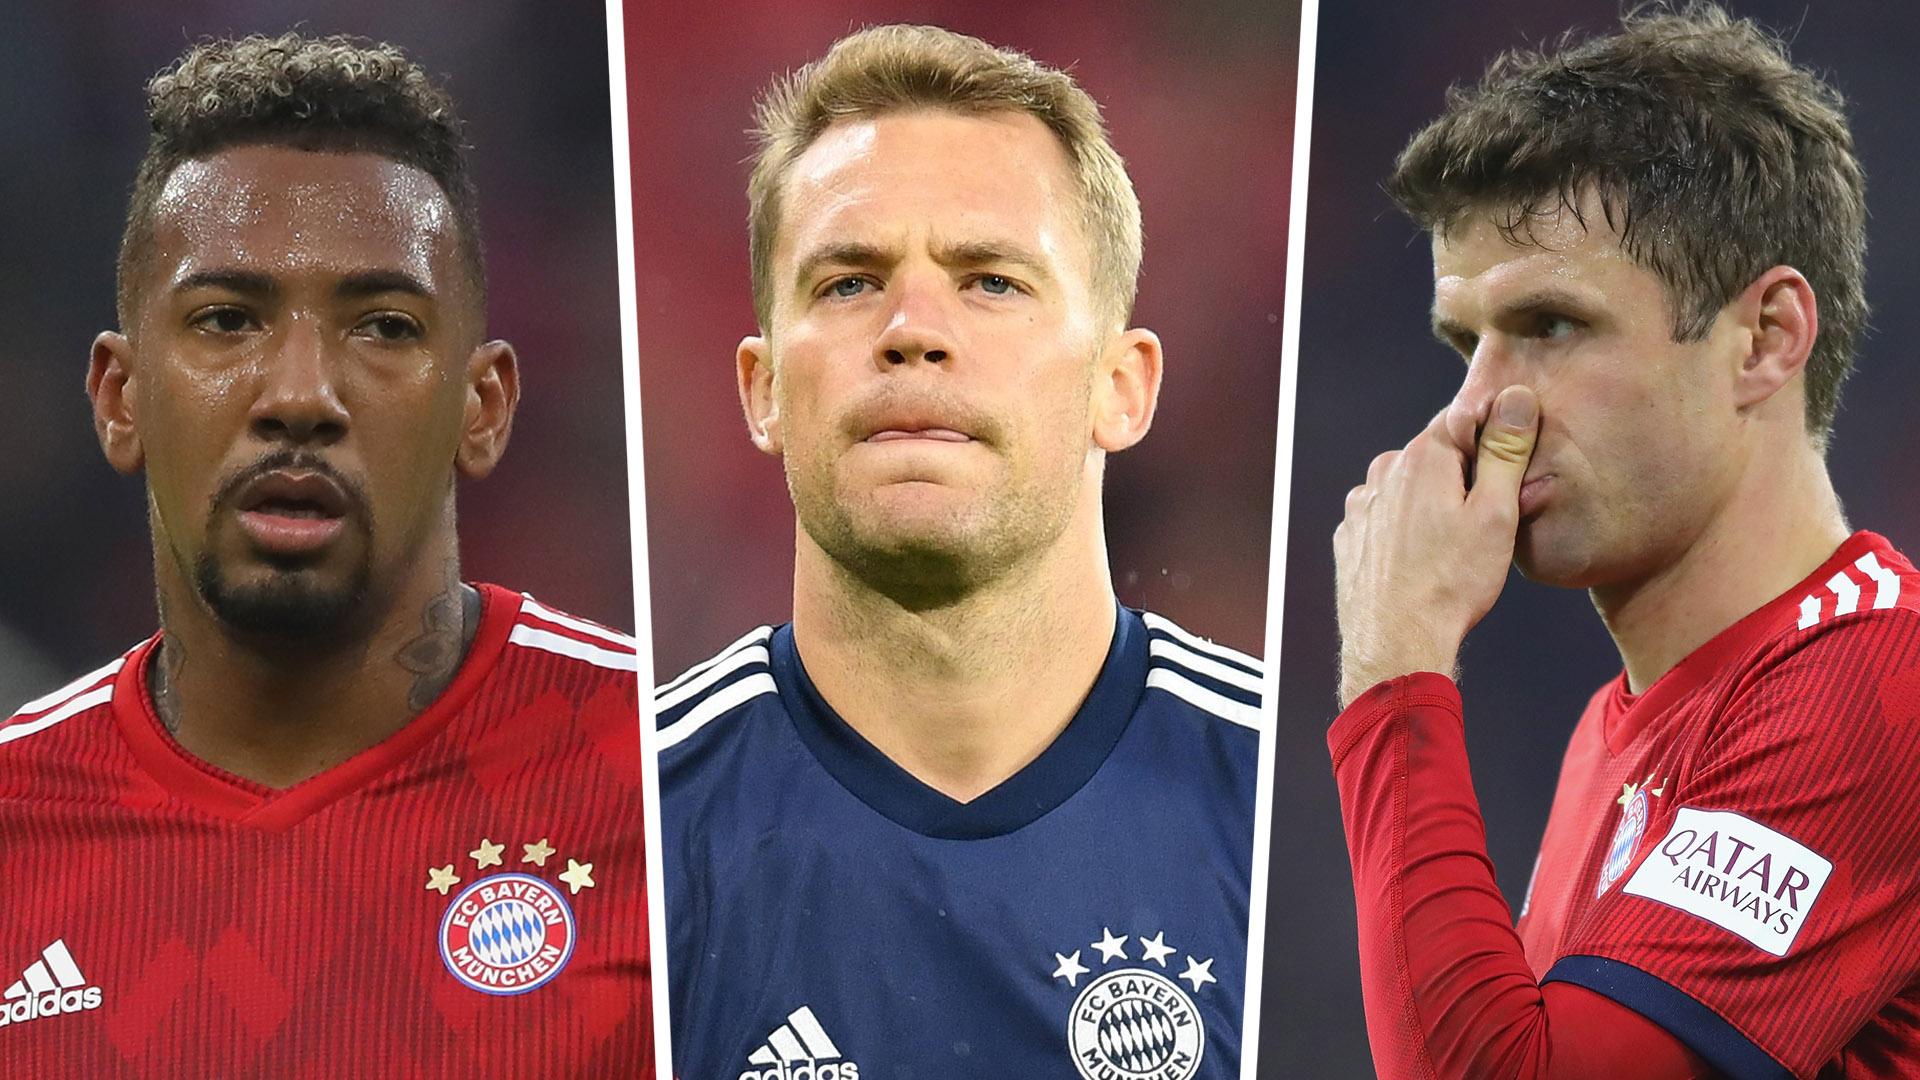 Boaten Neuer Muller Bayern Munich